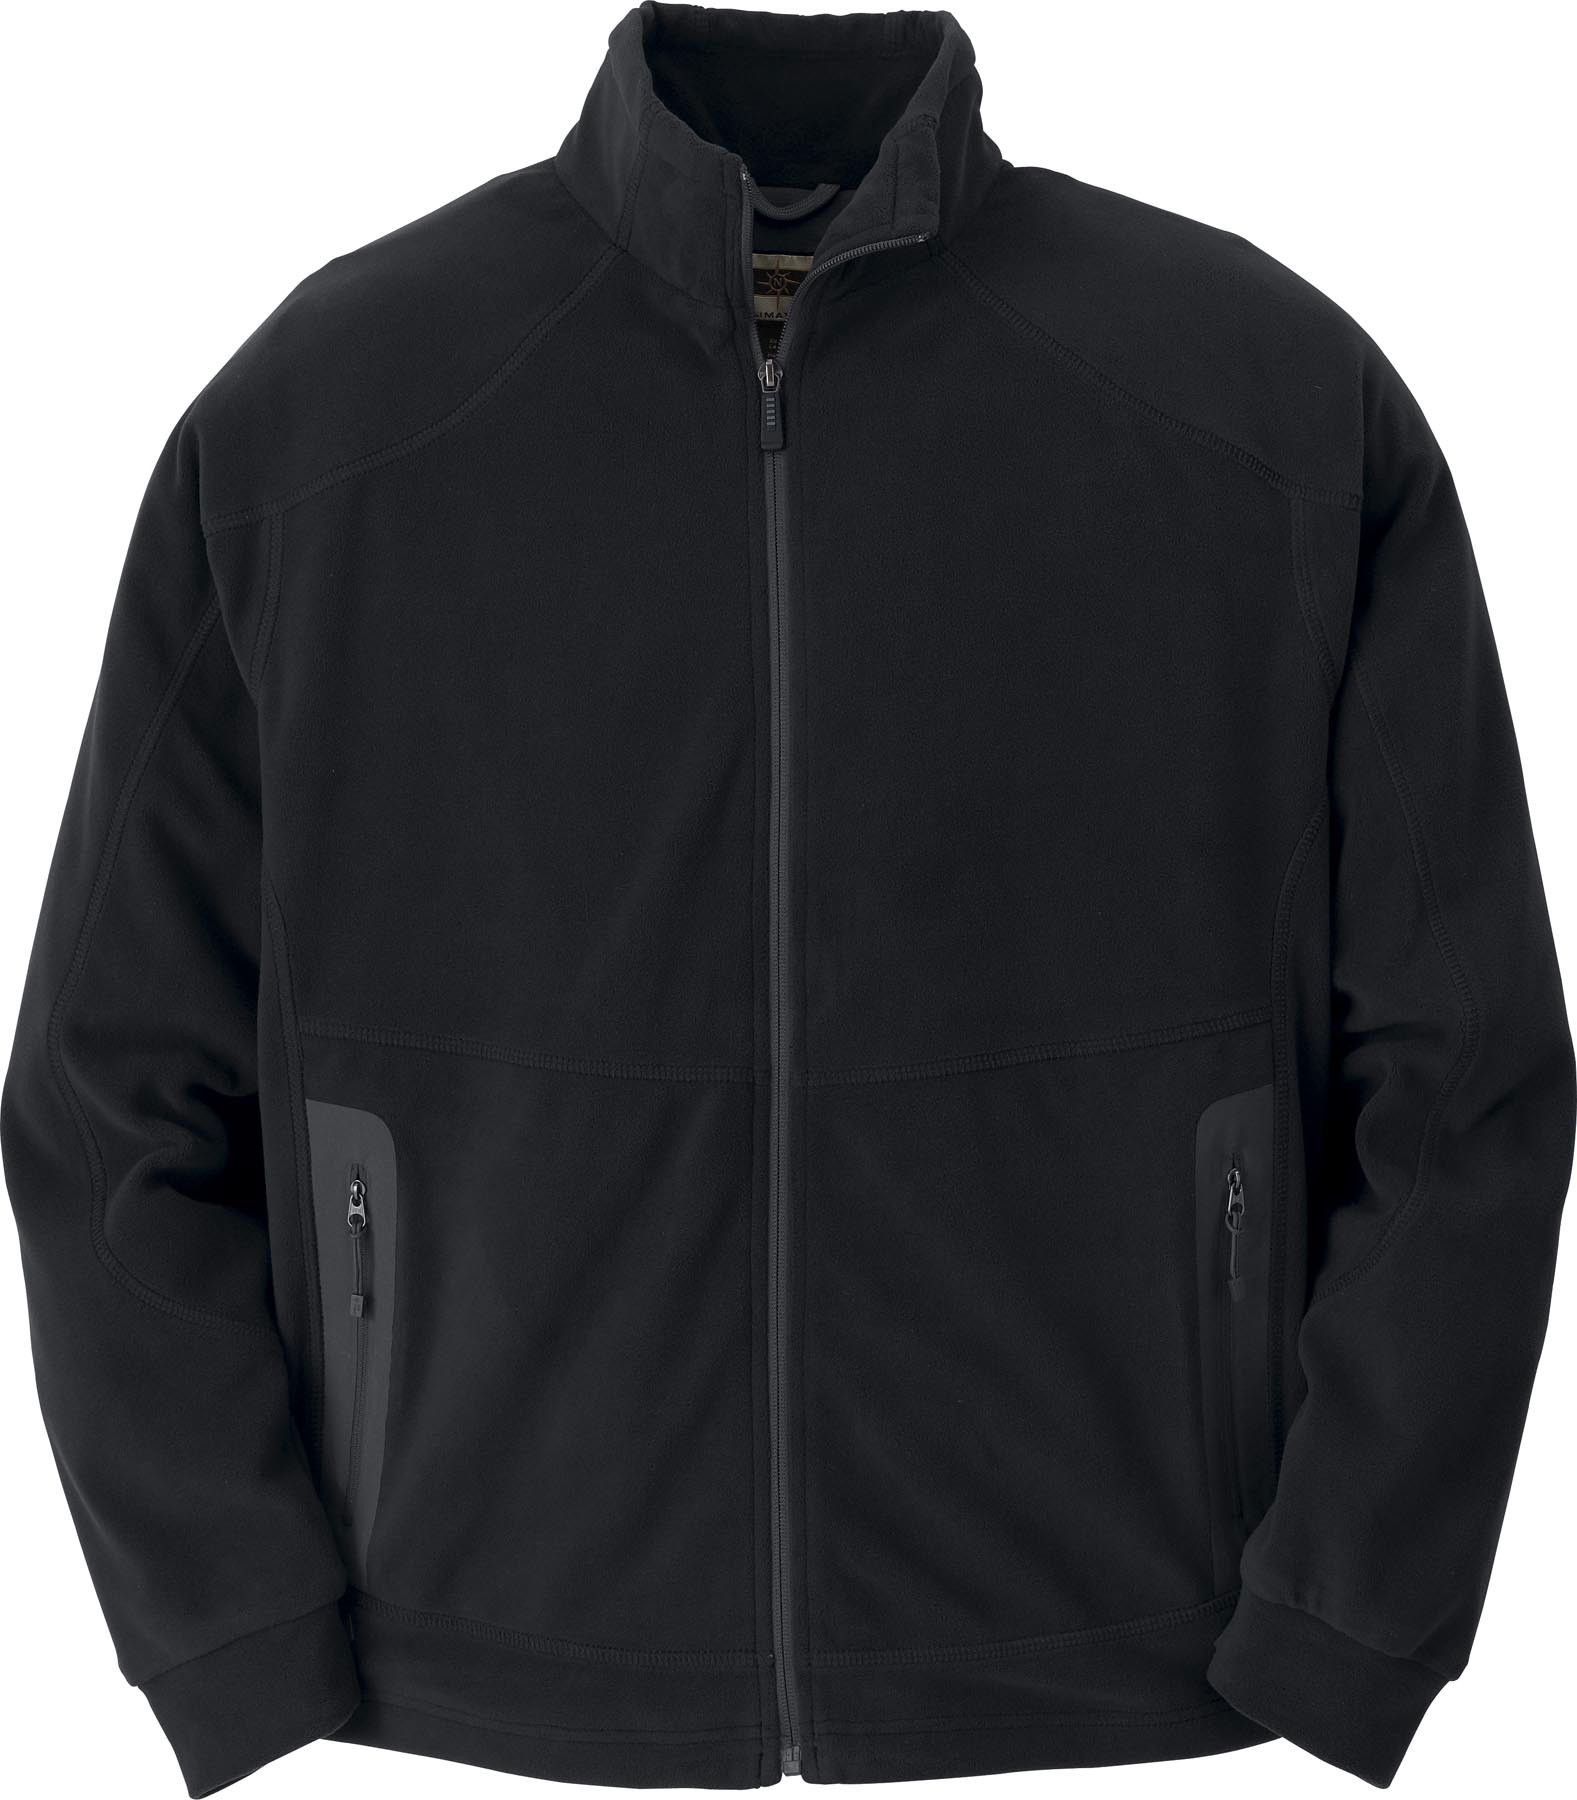 Ash City Microfleece 88134 - Men's Jacket With Windsmarttm ...